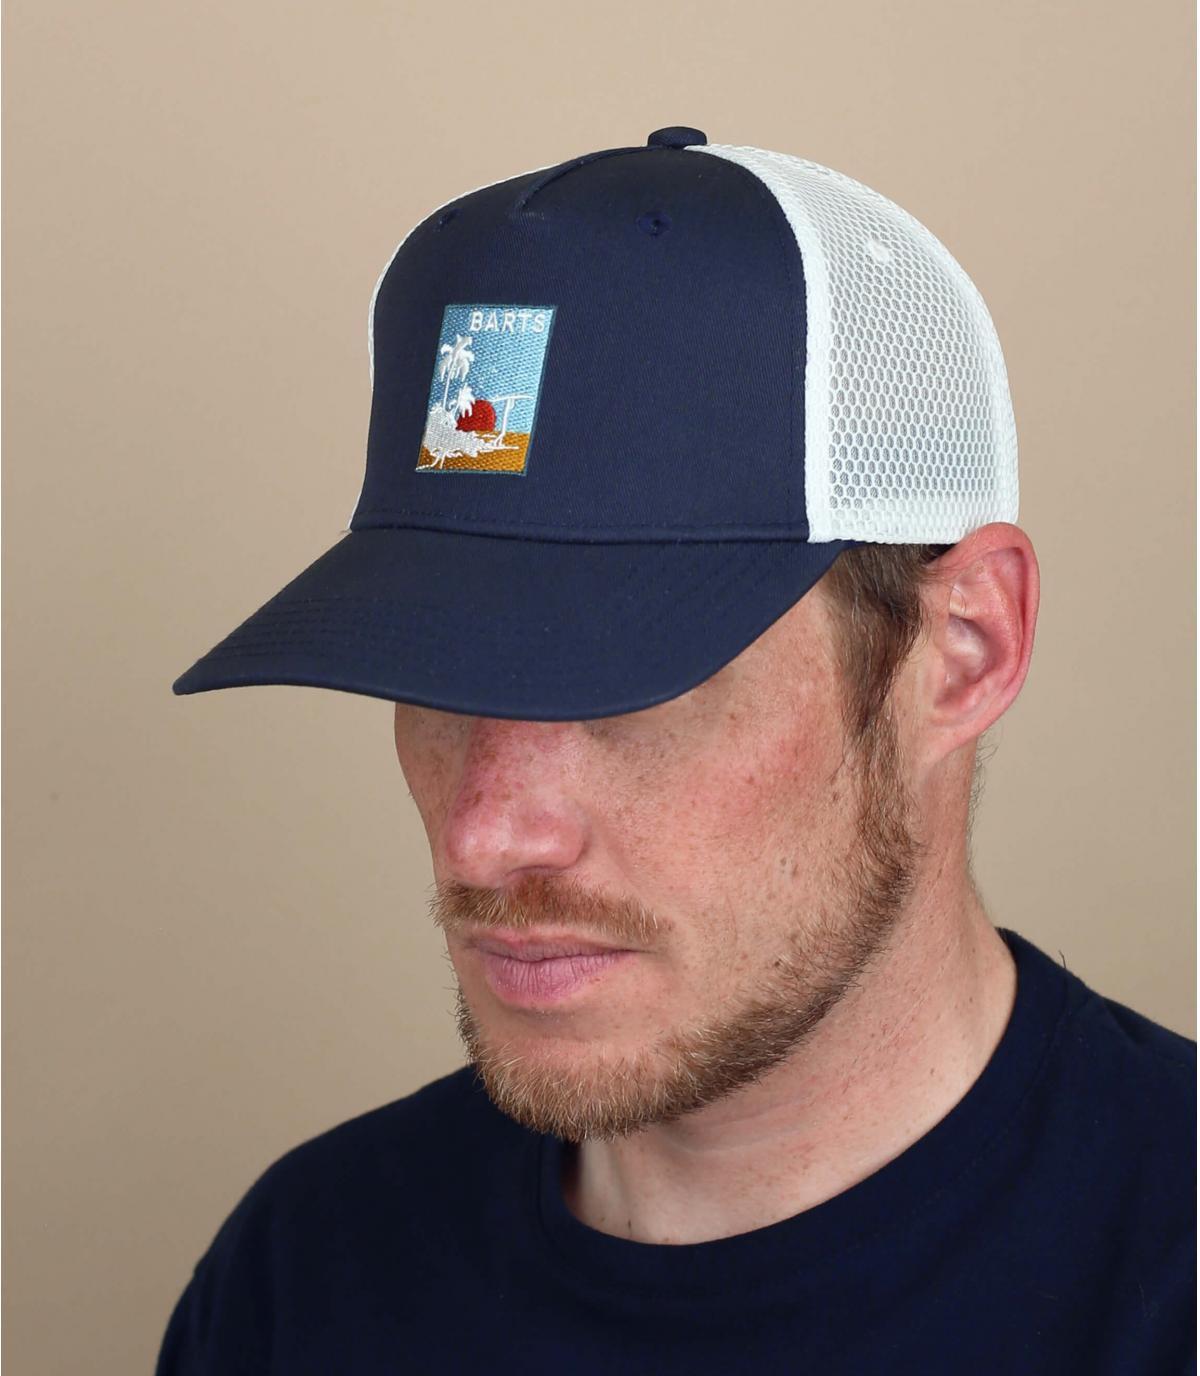 Barts trucker blauwe patch